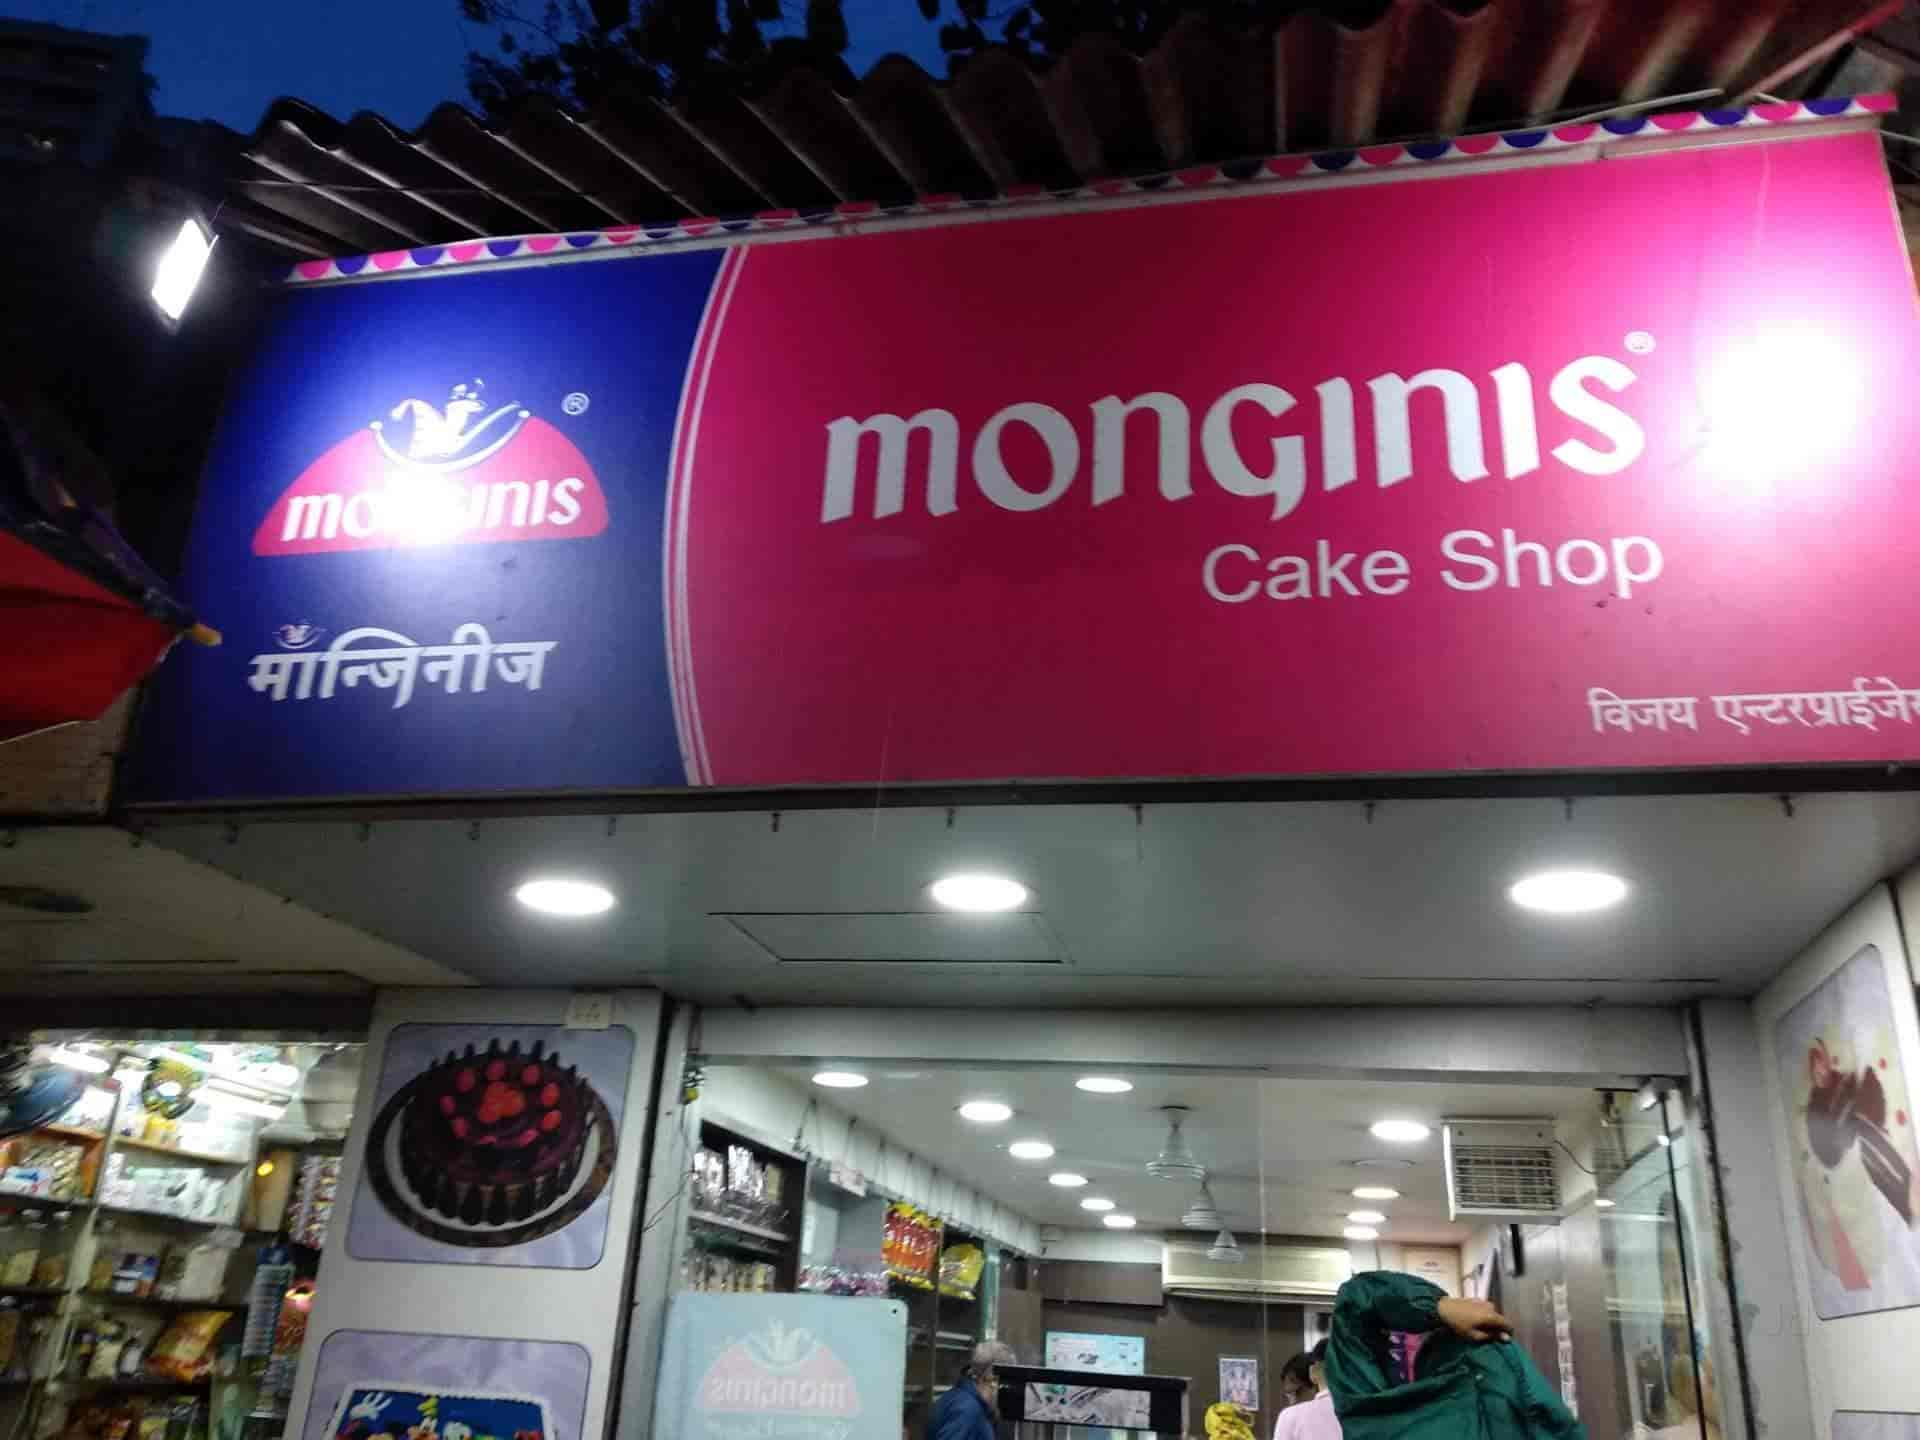 Monginis Cake Shop Photos, Dadar West, Mumbai- Pictures